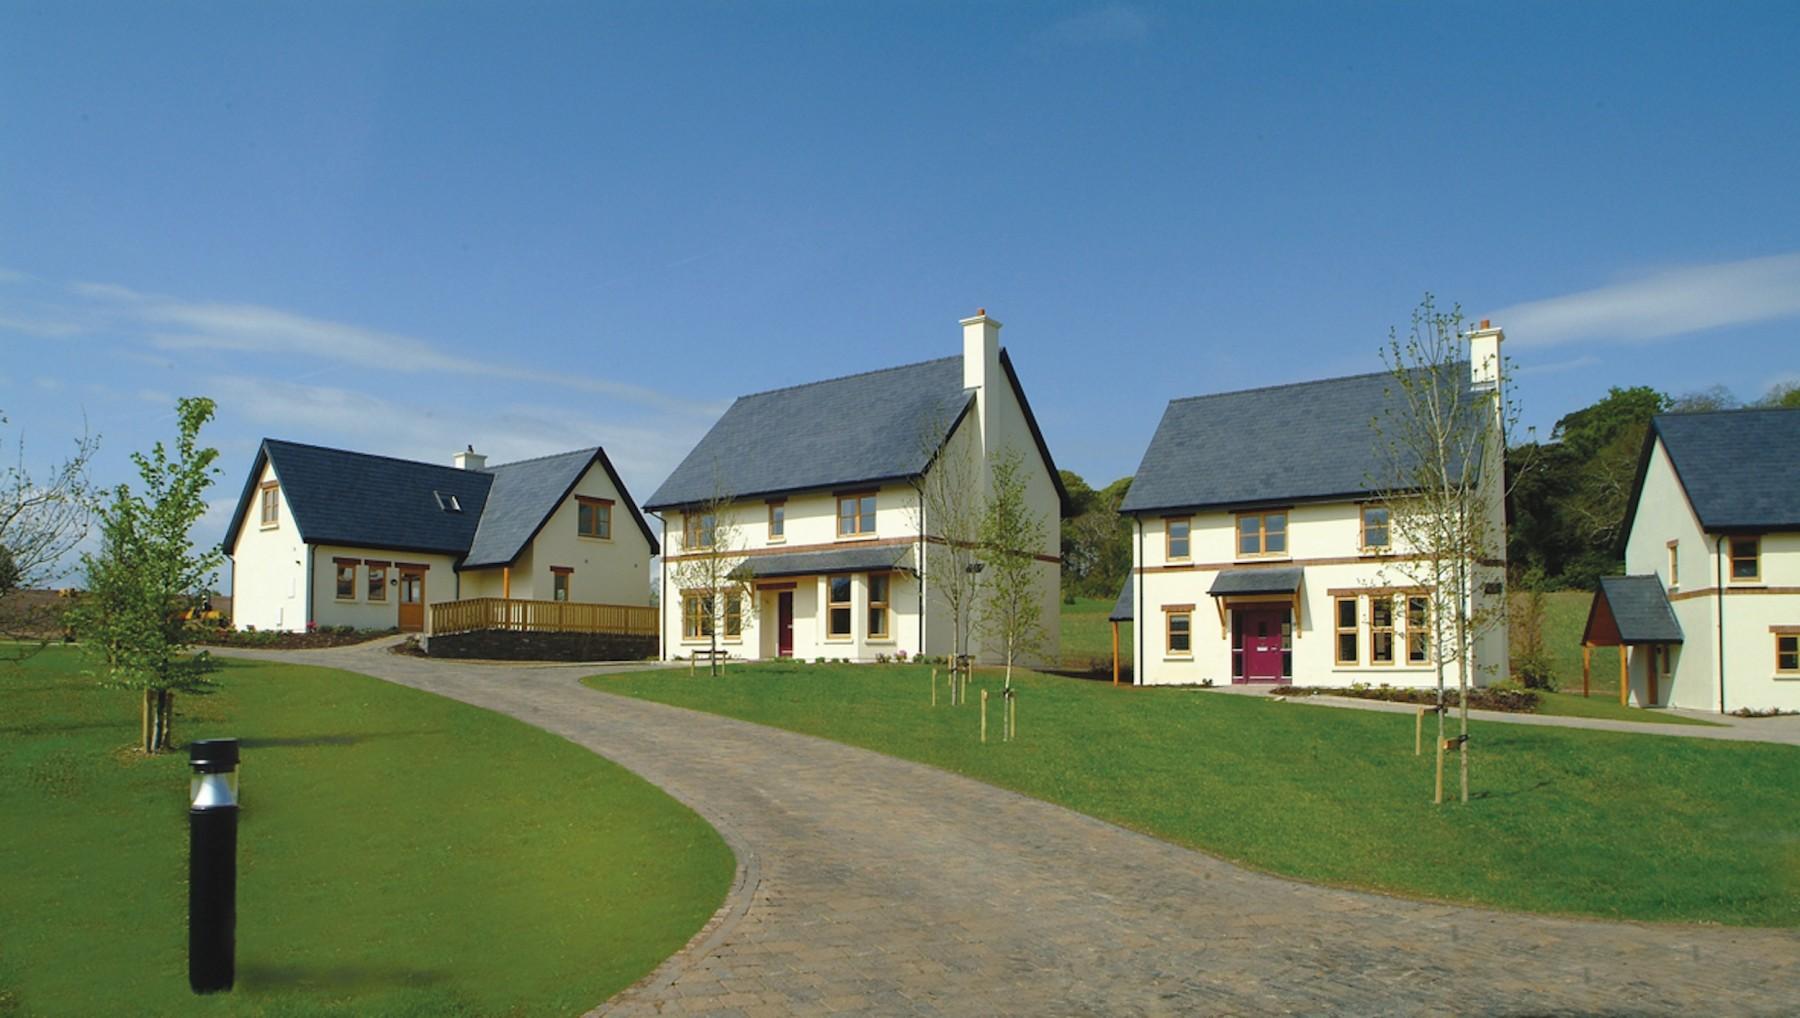 Houses In Fota Fota Courseside Lodges 3 Bed Standard